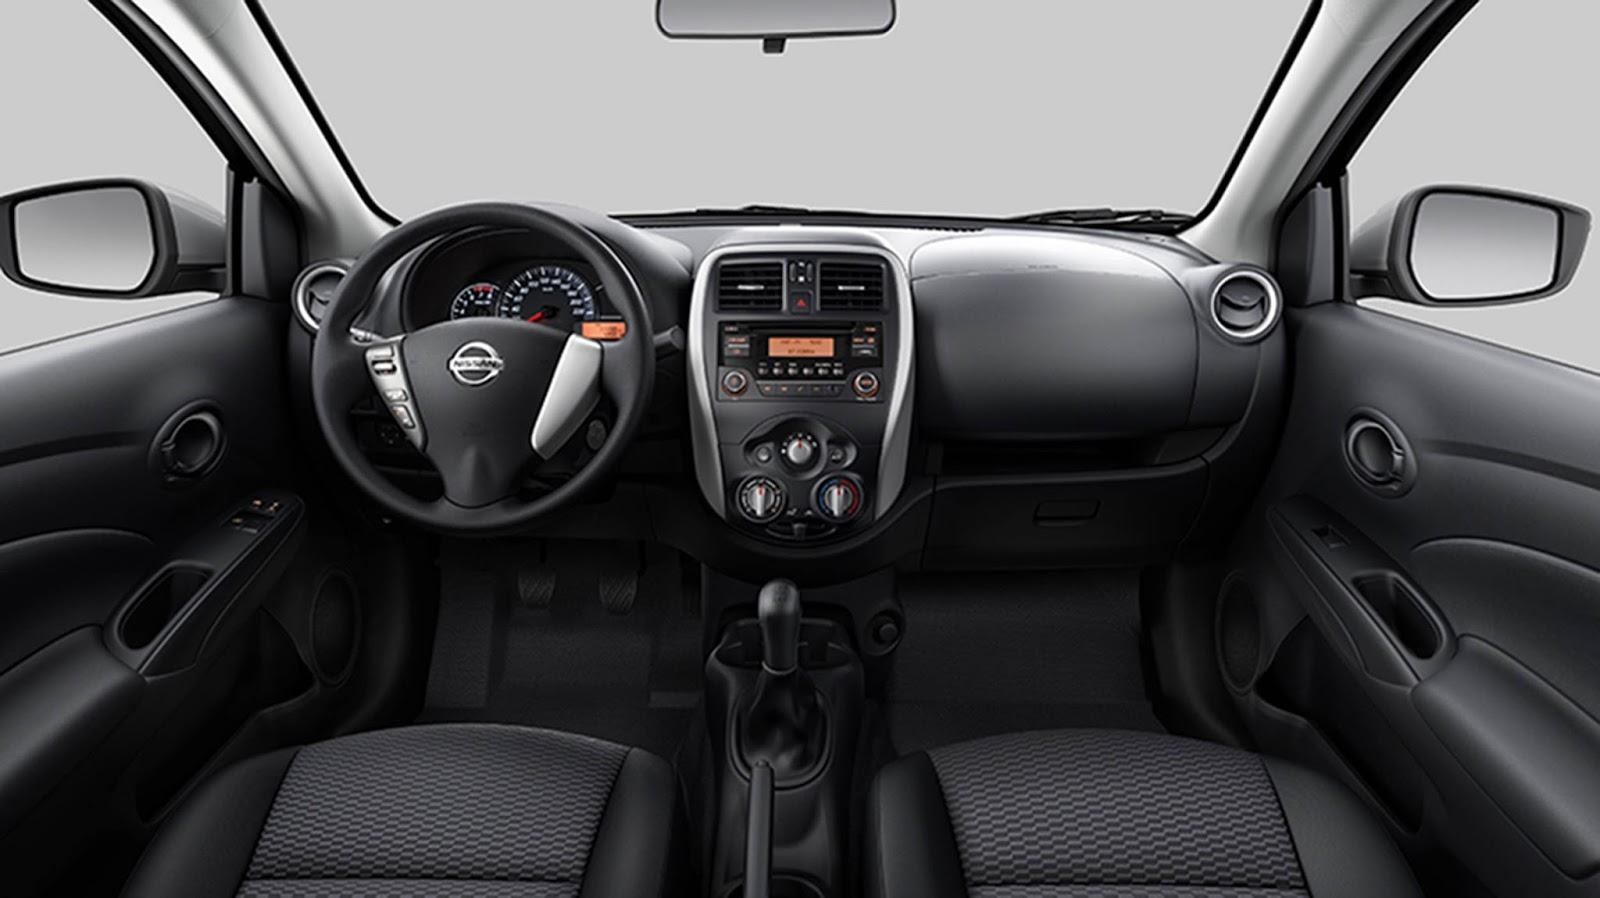 novo Nissan Versa 2015 - interior - painel